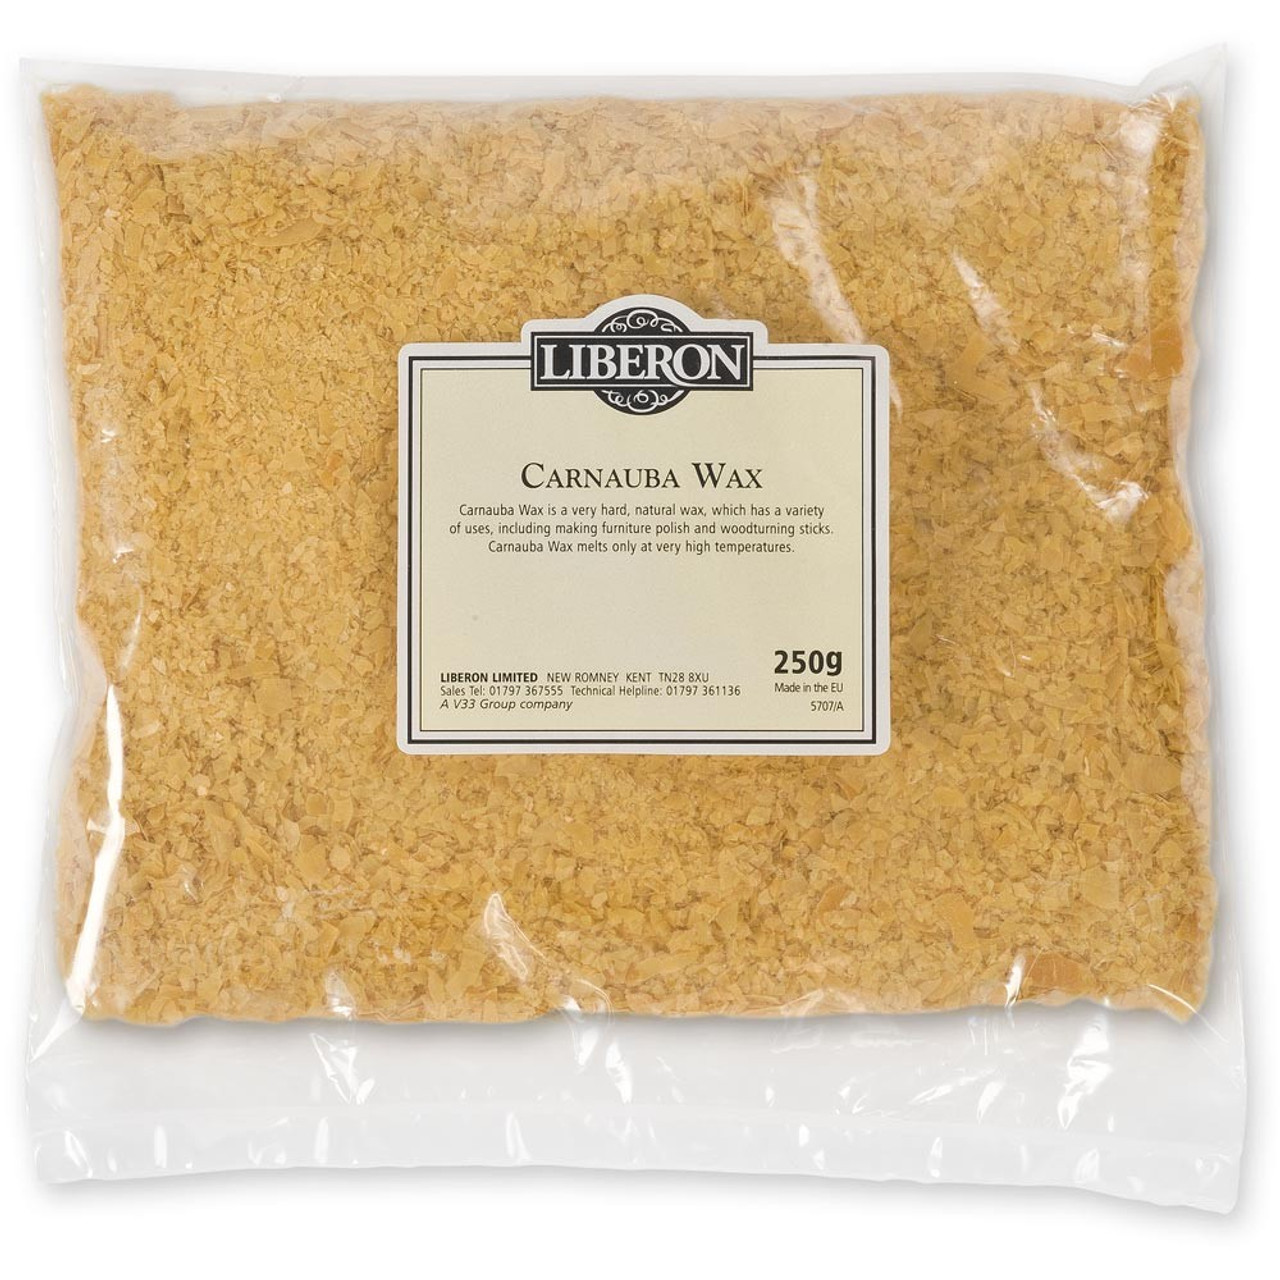 Liberon Carnauba Wax  Flakes 250g